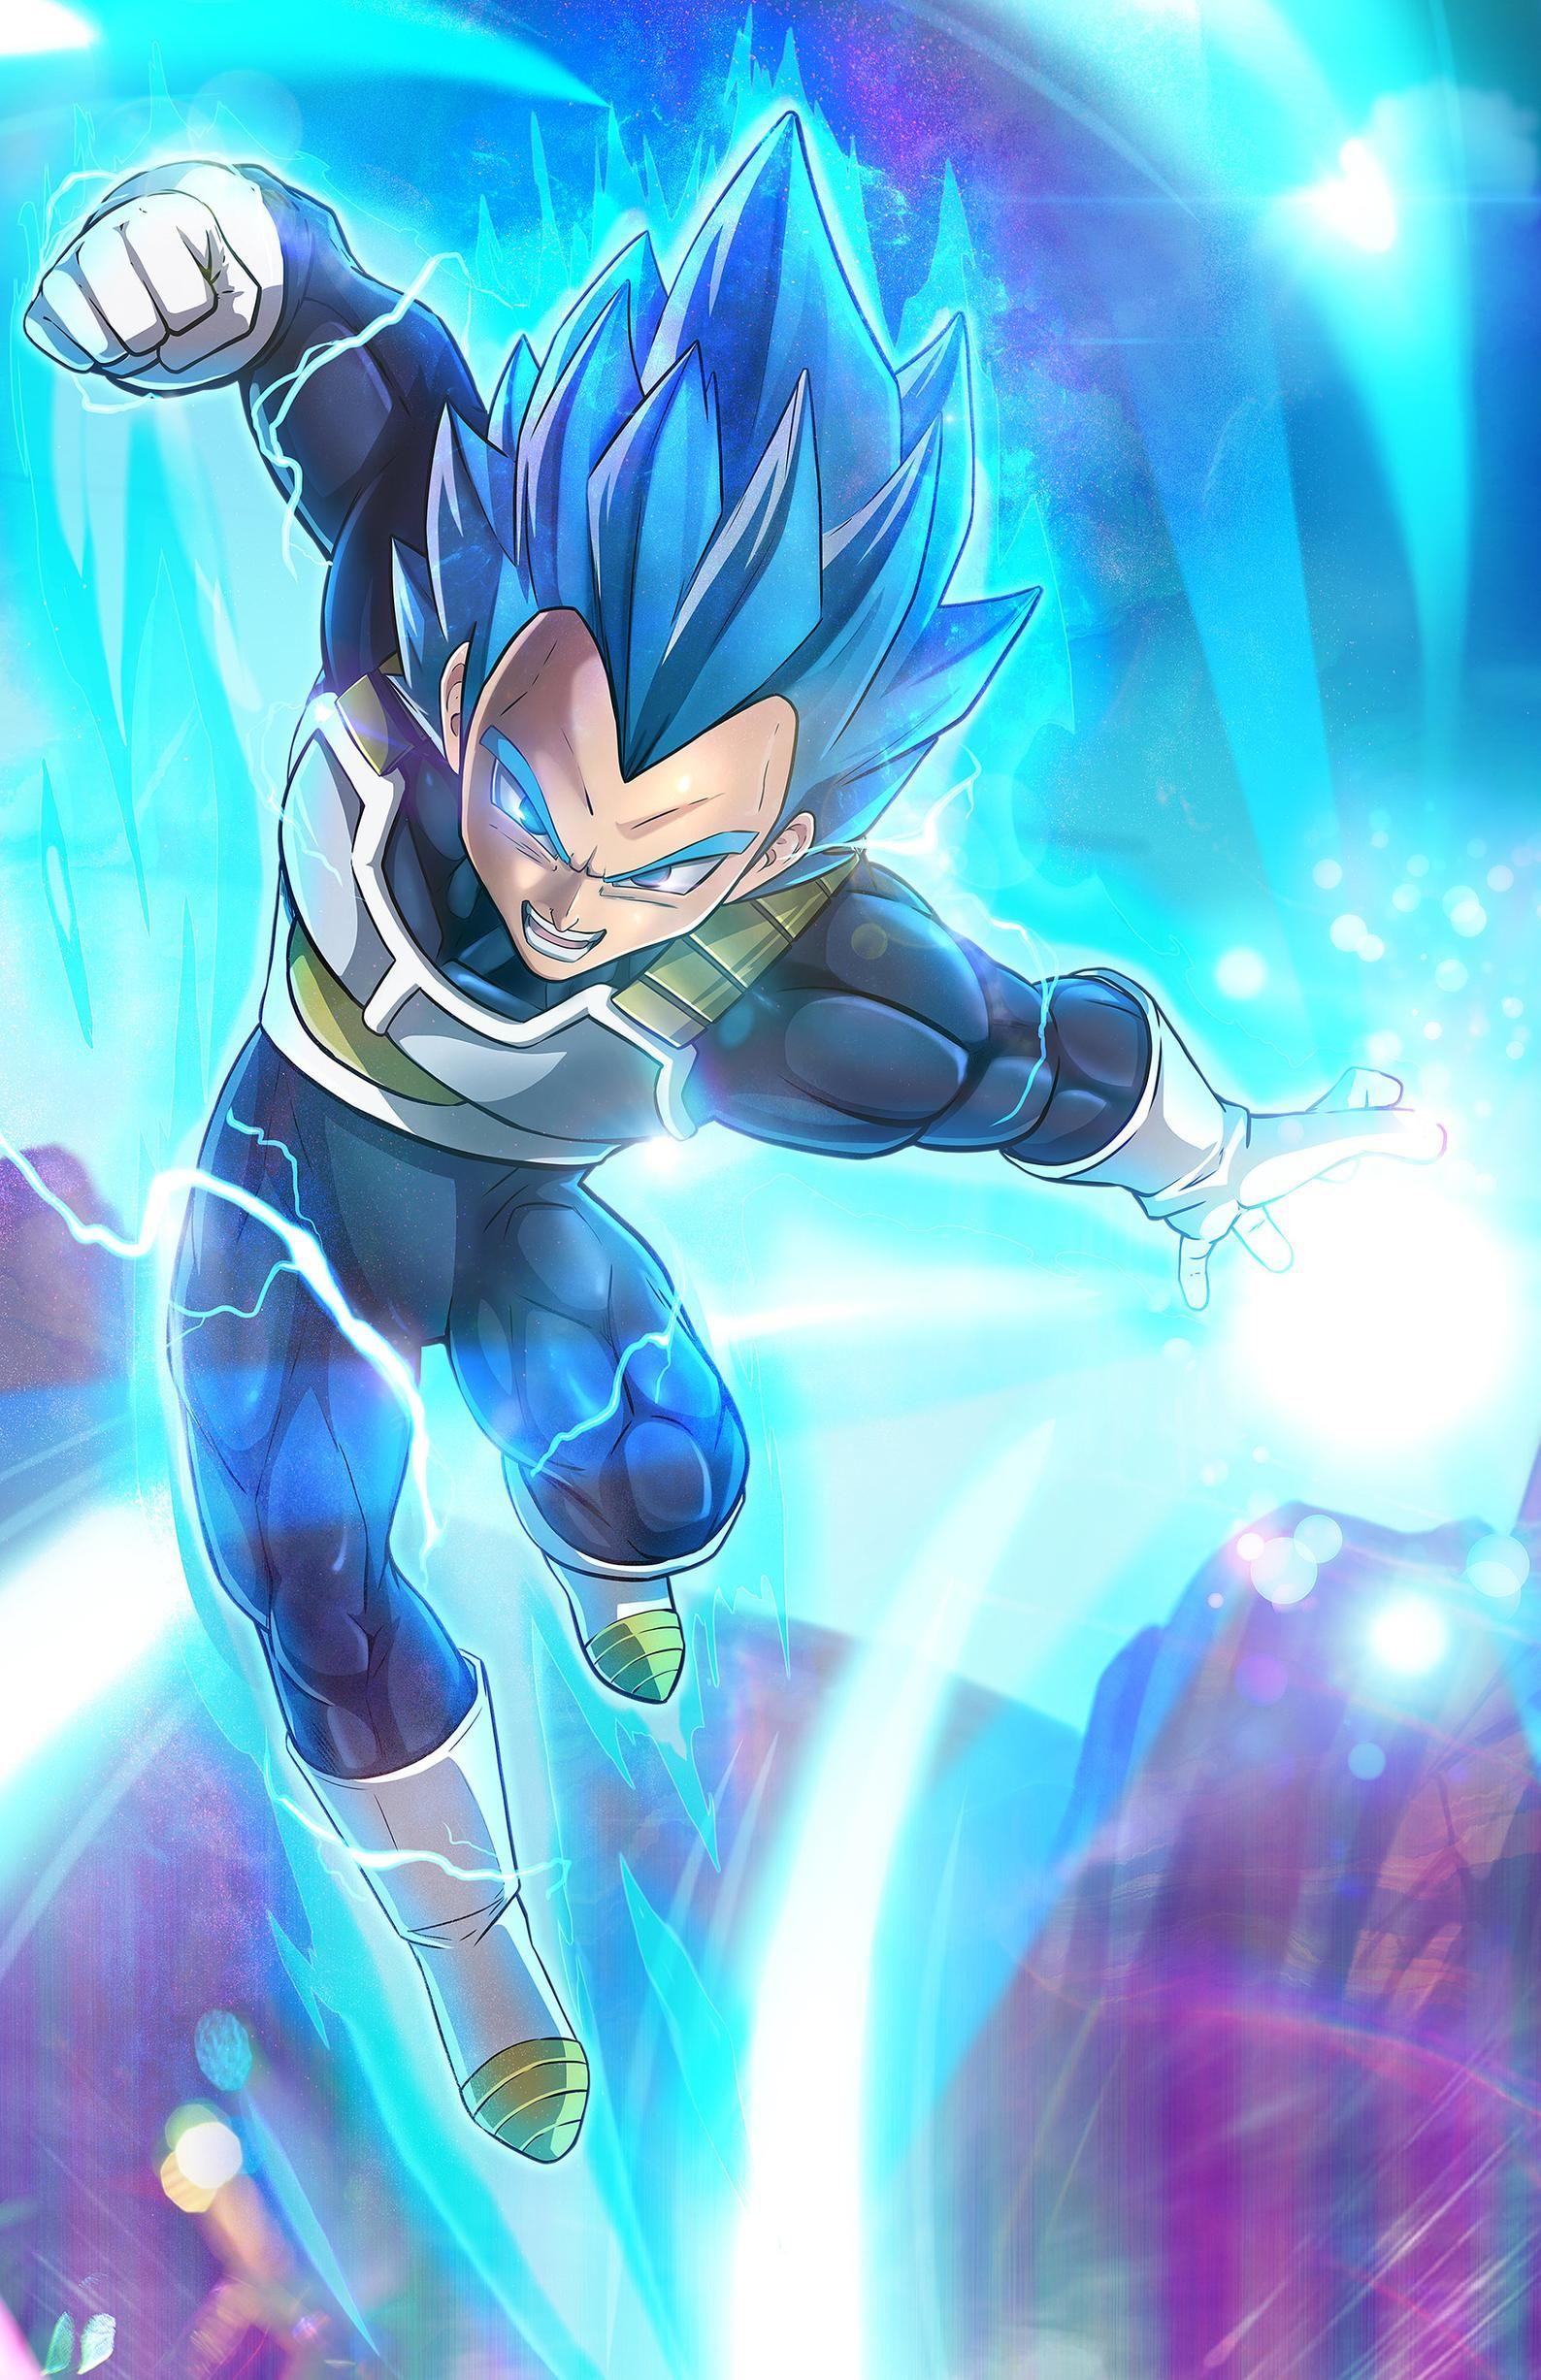 Vegeta Blue Etsy in 2020 Dragon ball super art, Dragon